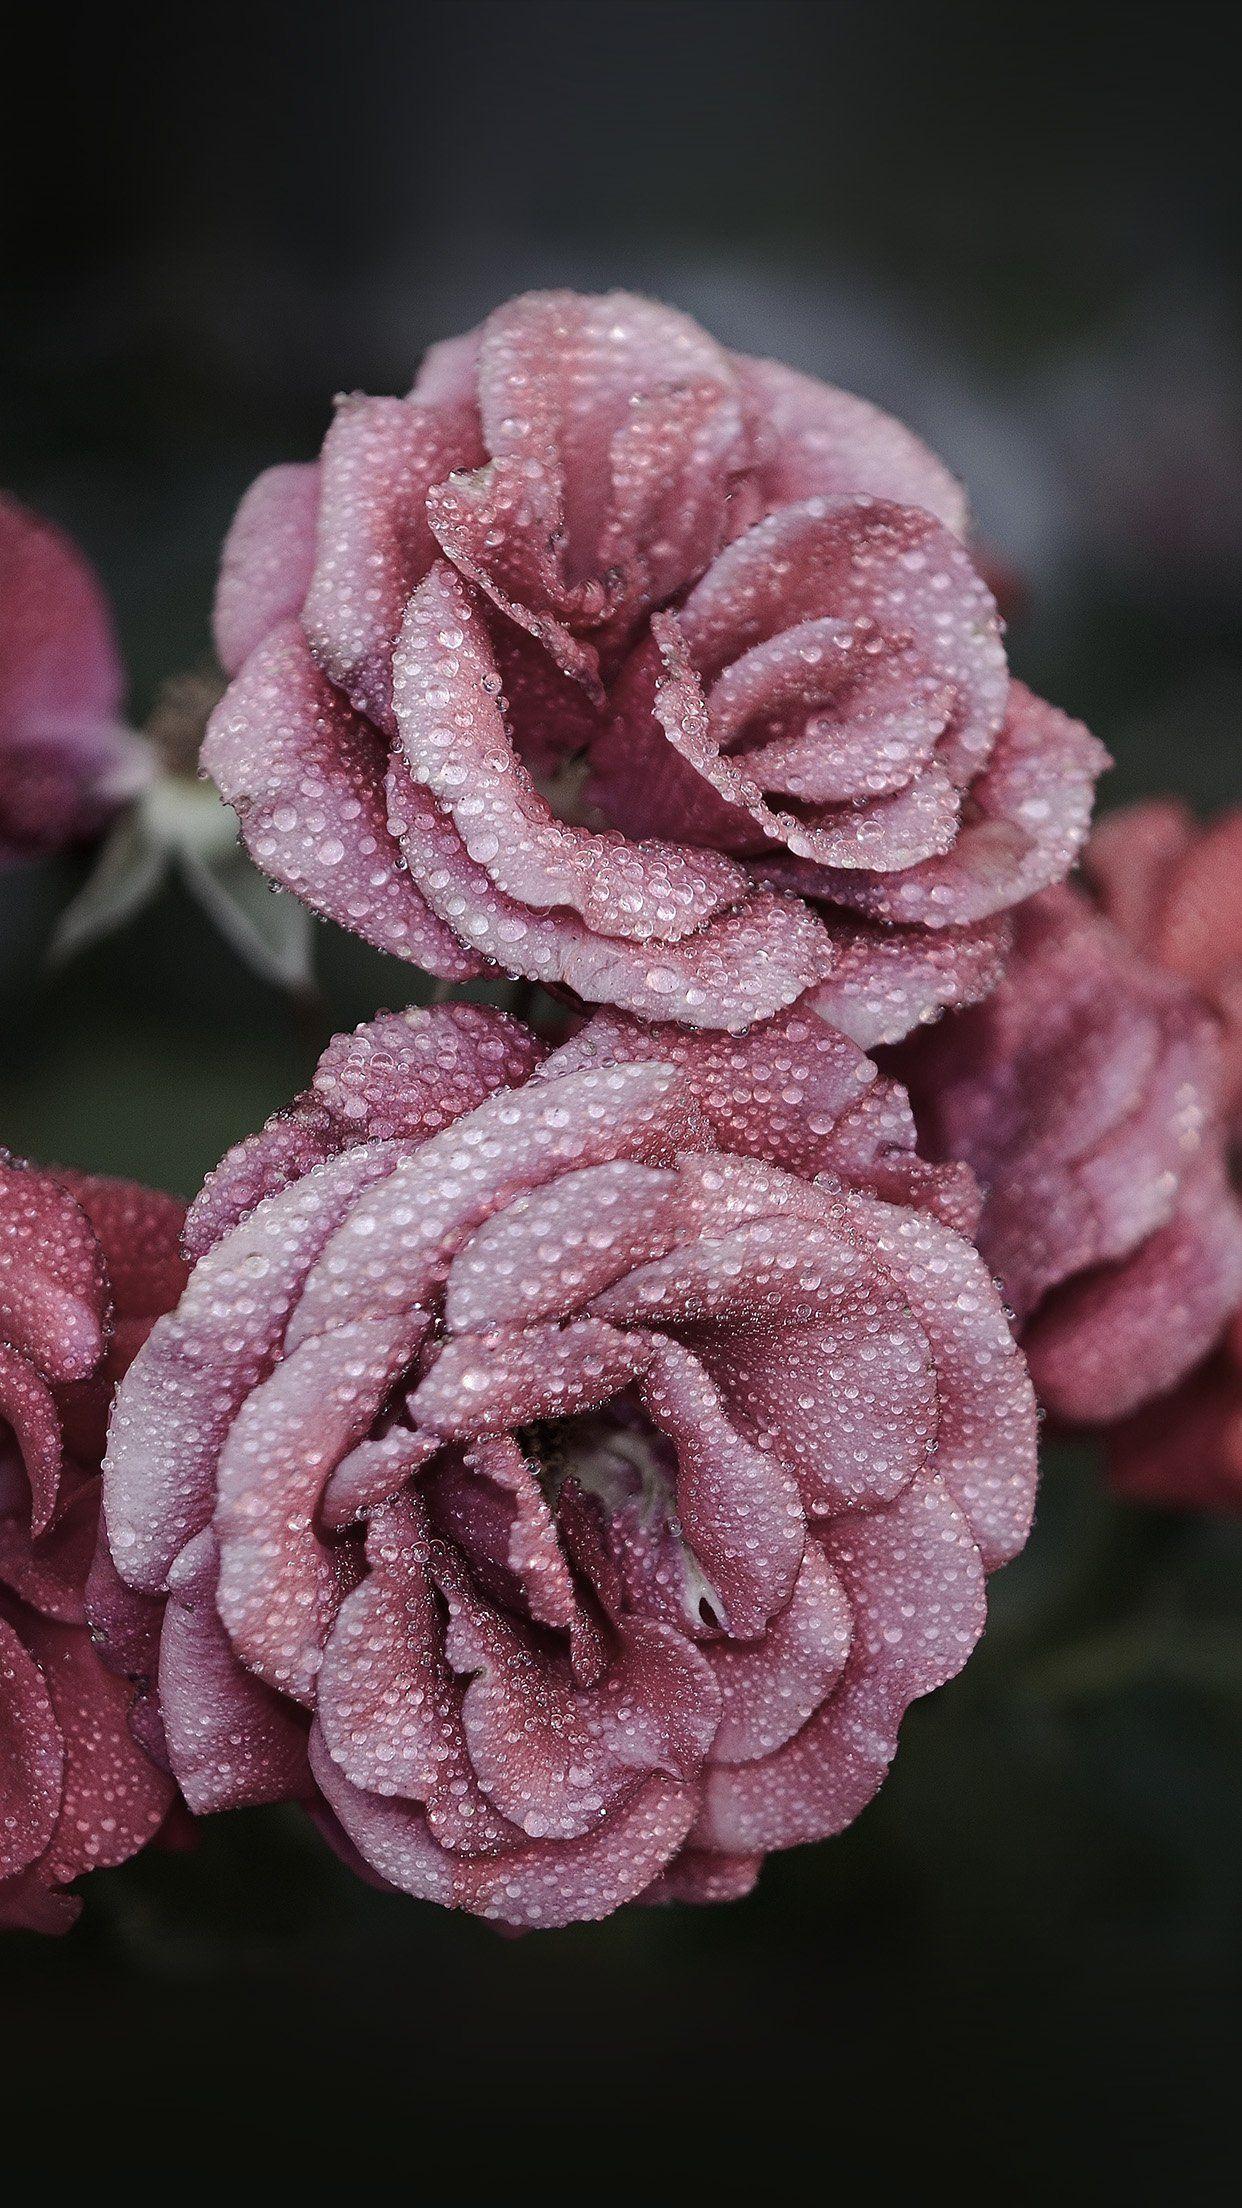 Cool Rose Pink Raindrop Flower Summer Nature Iphone6 - Iphone Xs Max Wallpaper Flowers , HD Wallpaper & Backgrounds